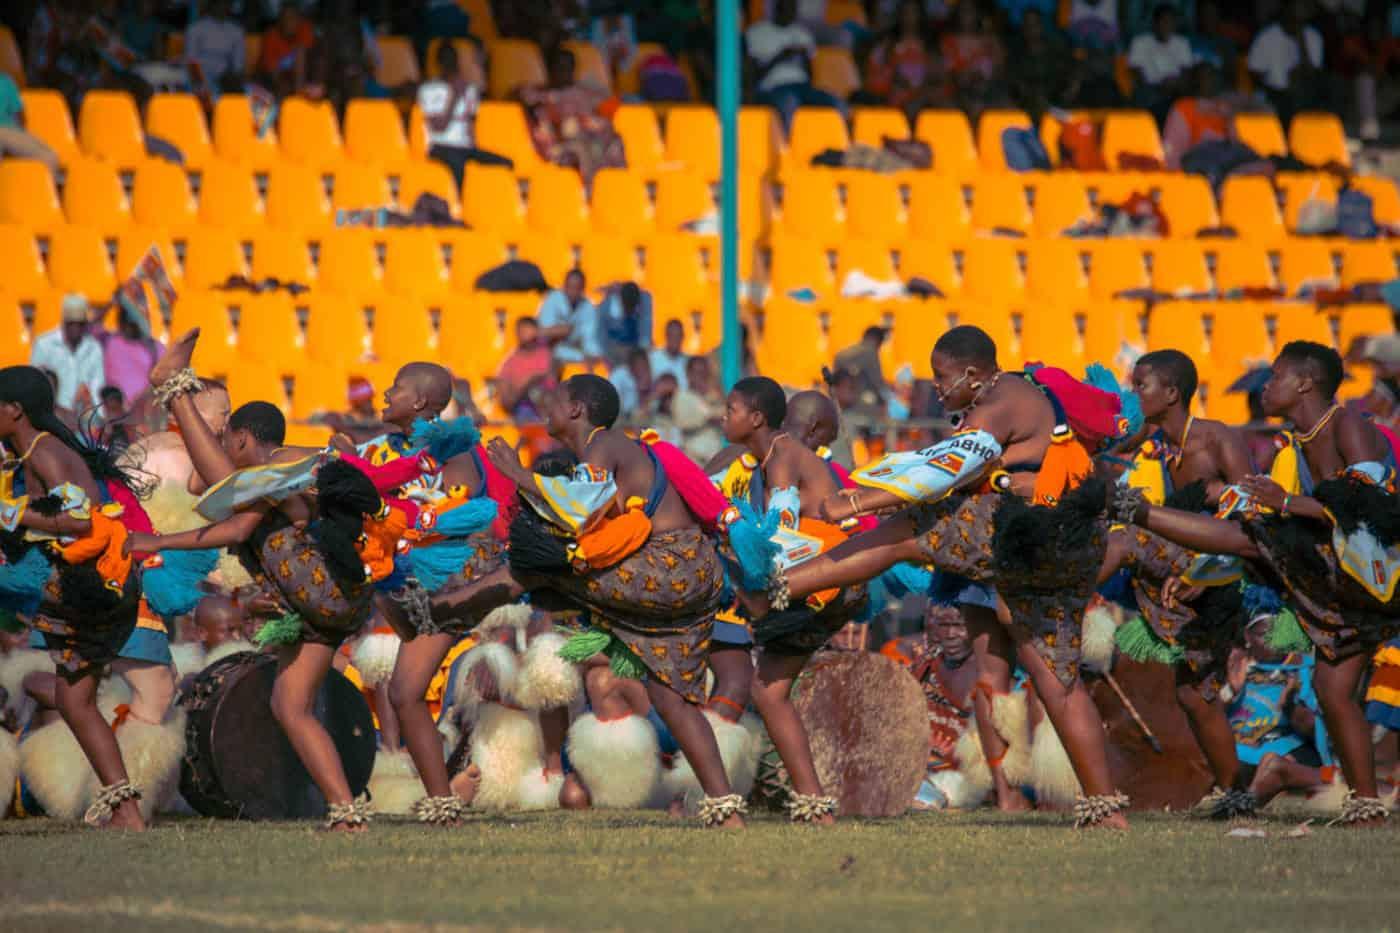 Swaziland traditional dancing